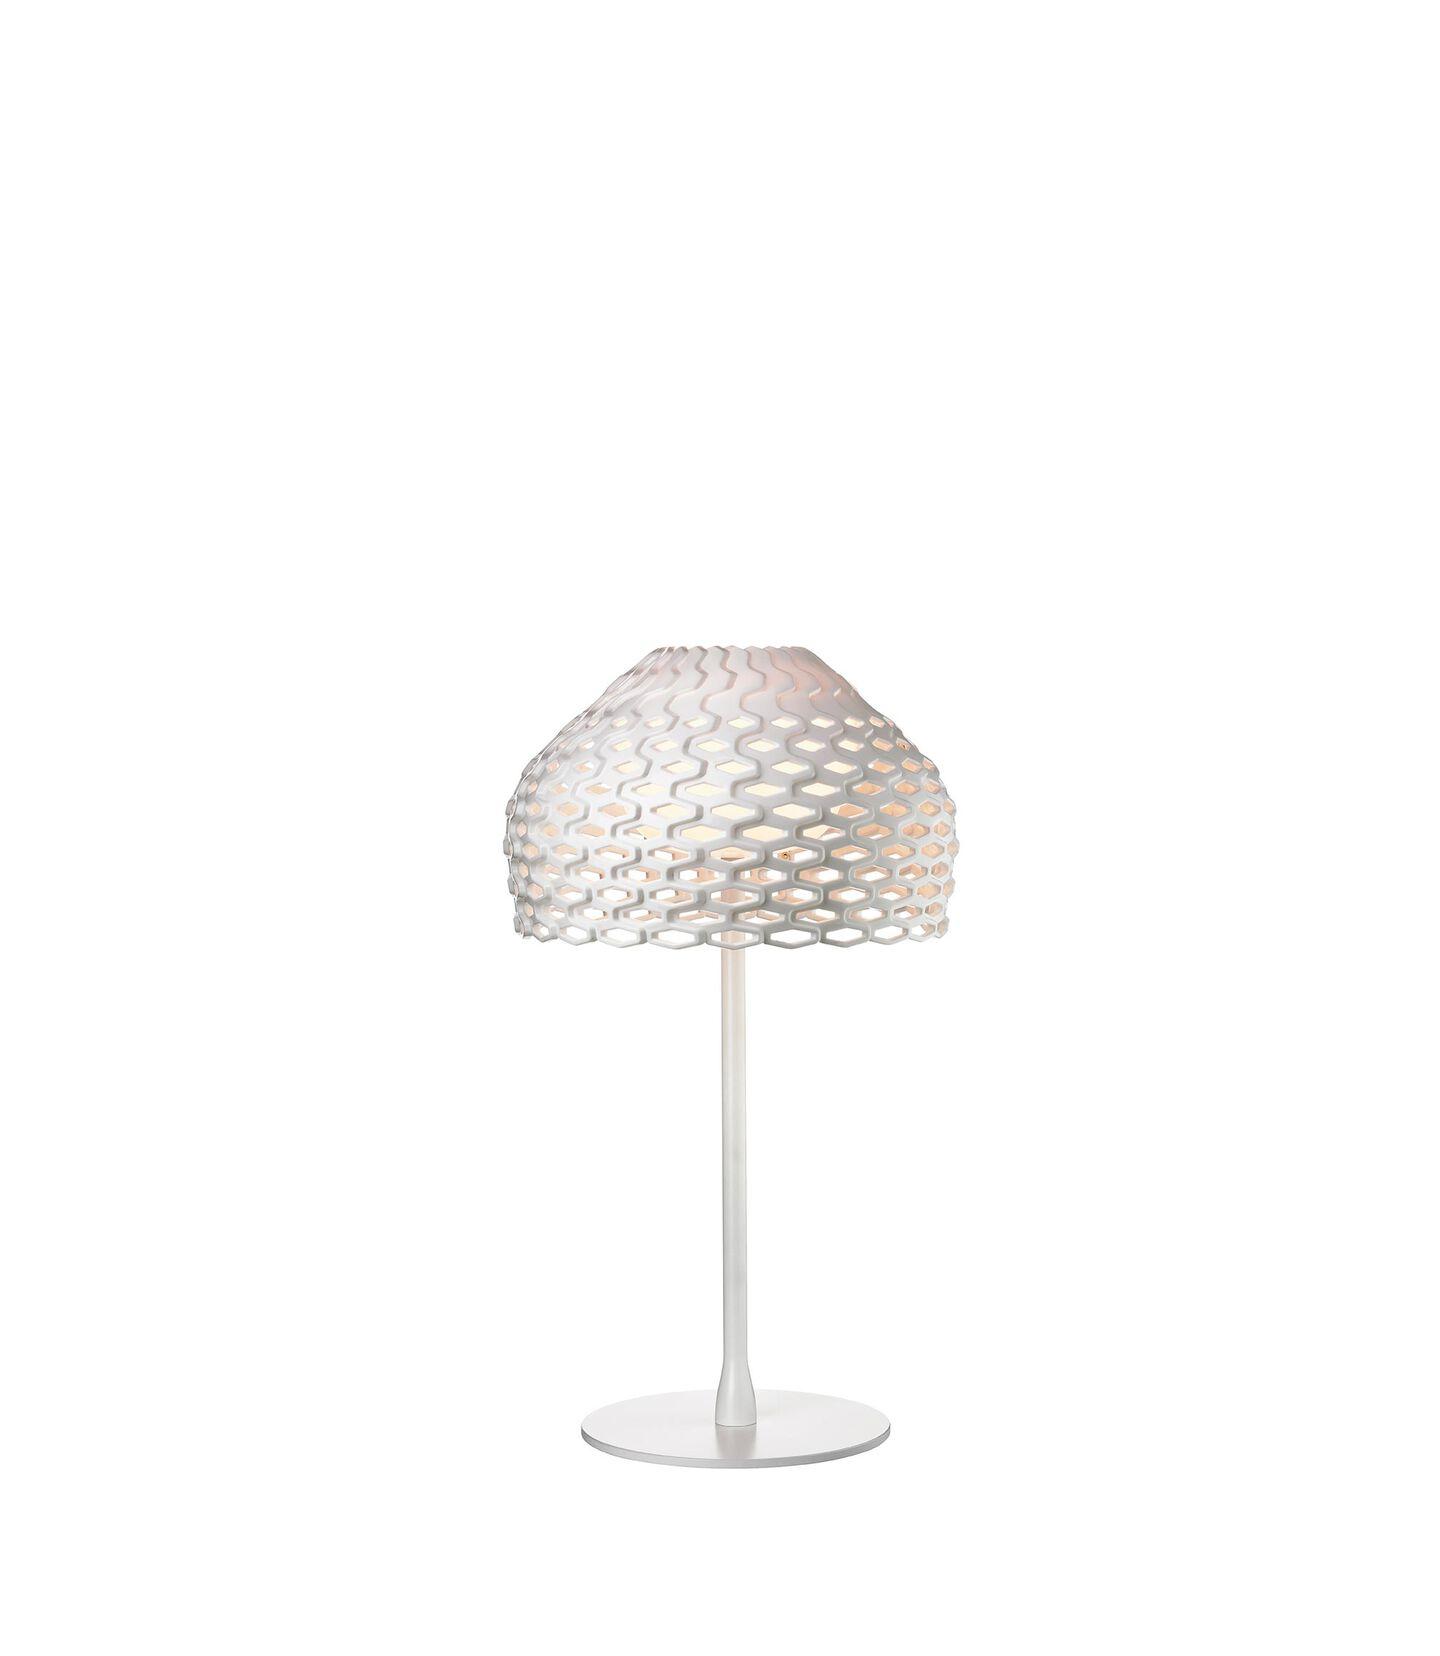 tatou-table-urquiola-flos-F7761009-product-still-life-big-1